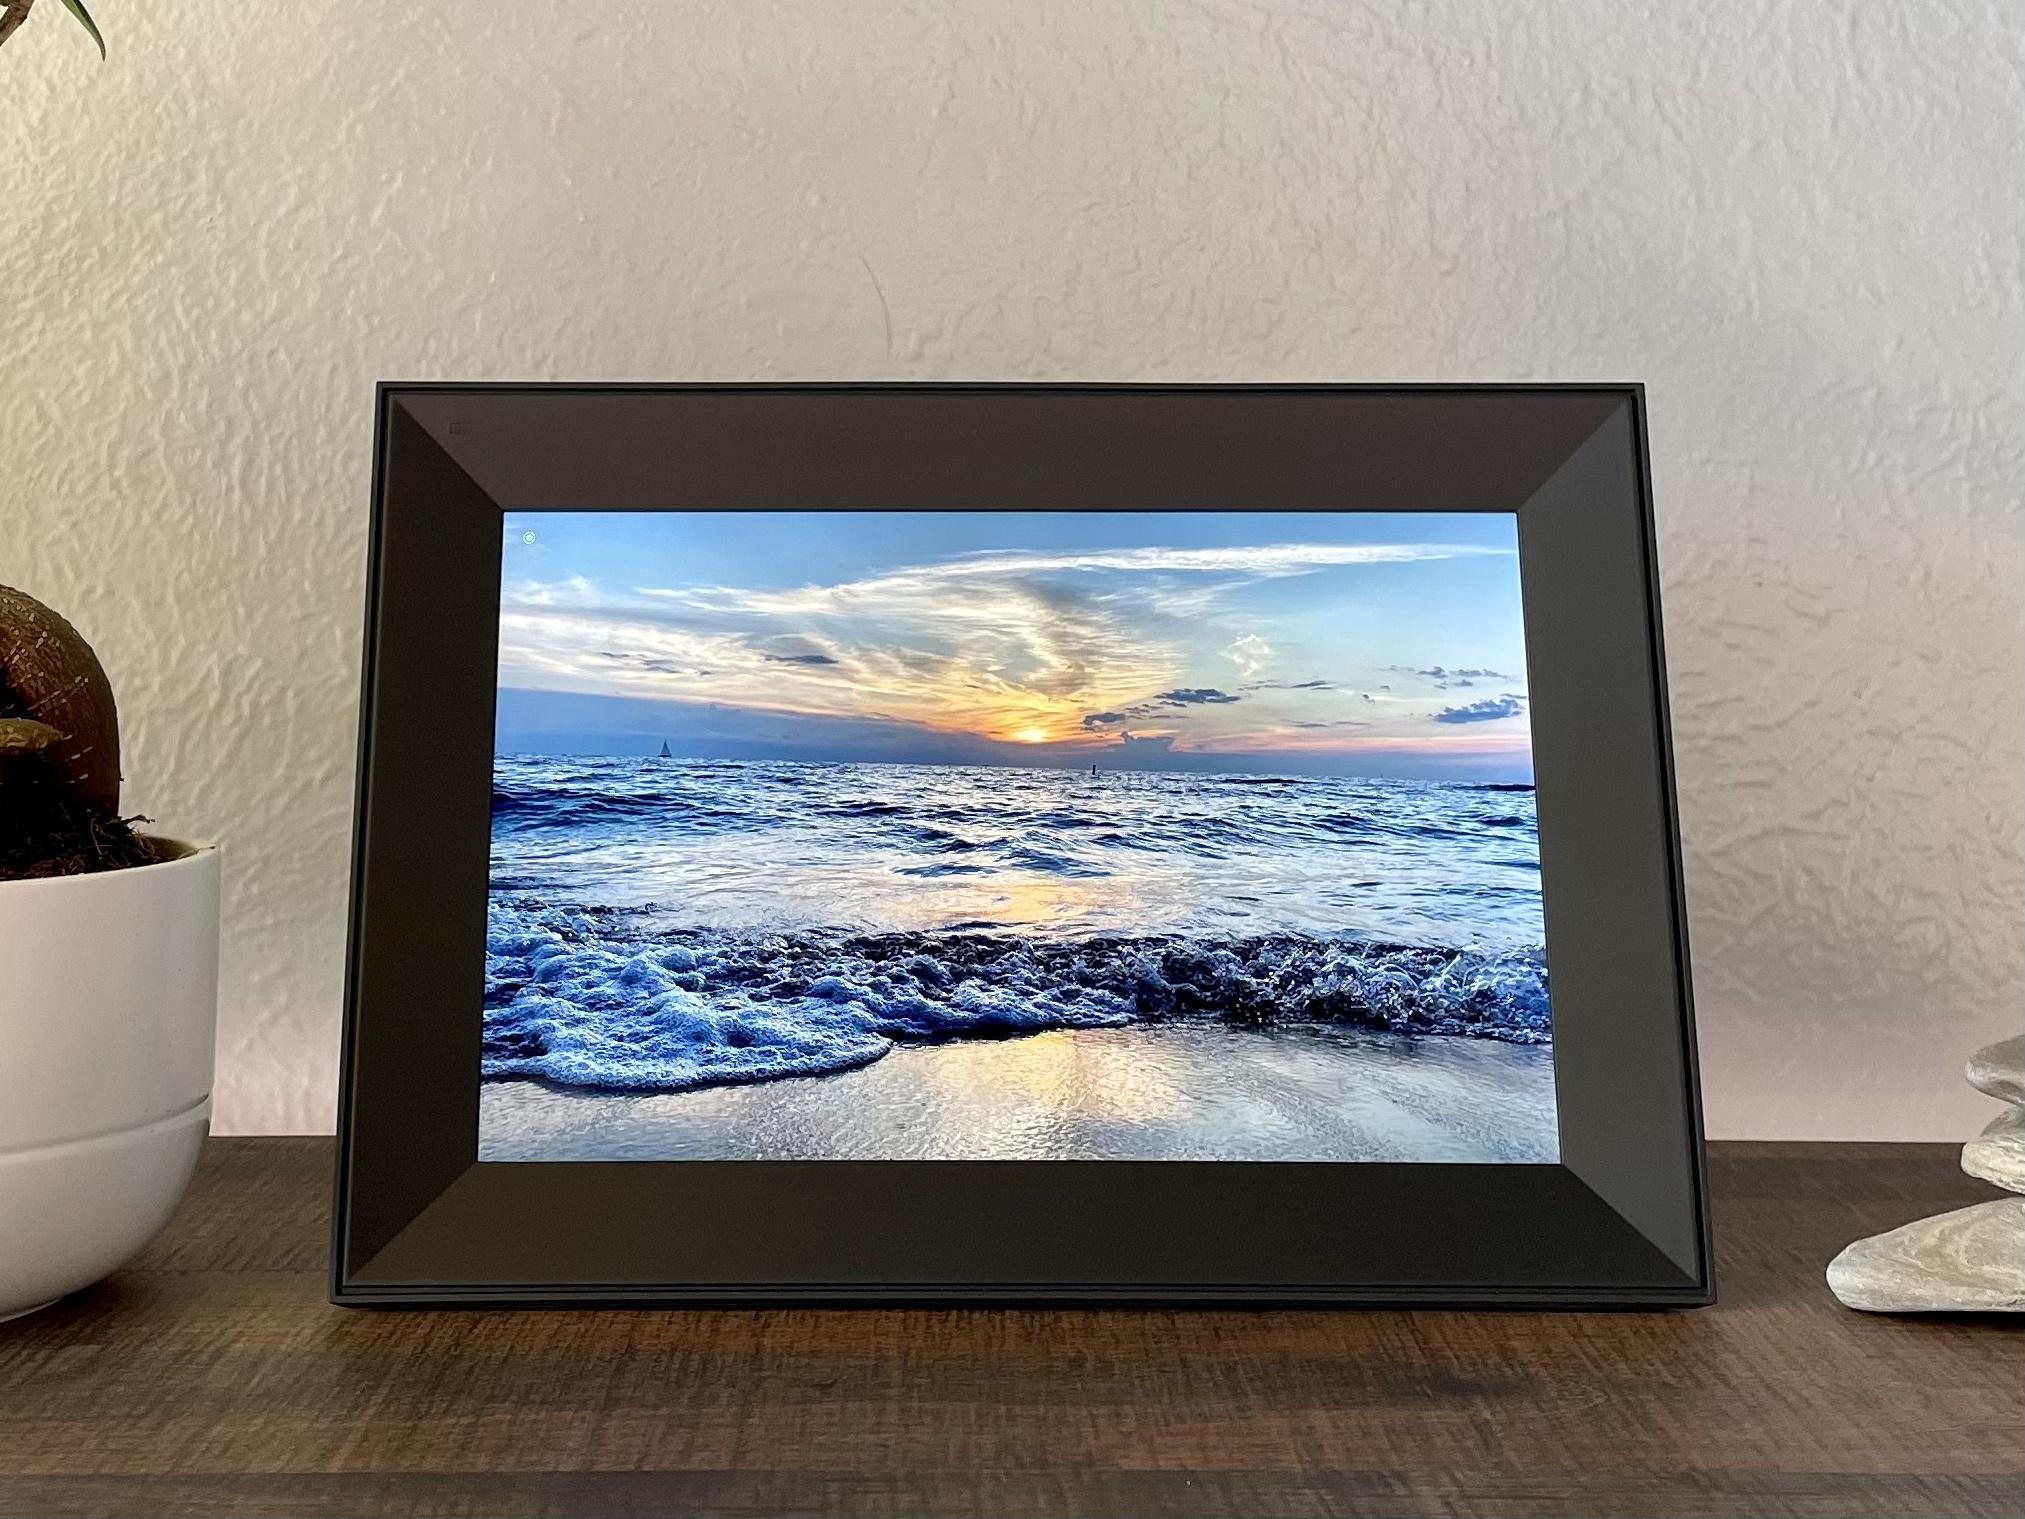 Aura Carver Review - Digital Picture Frame